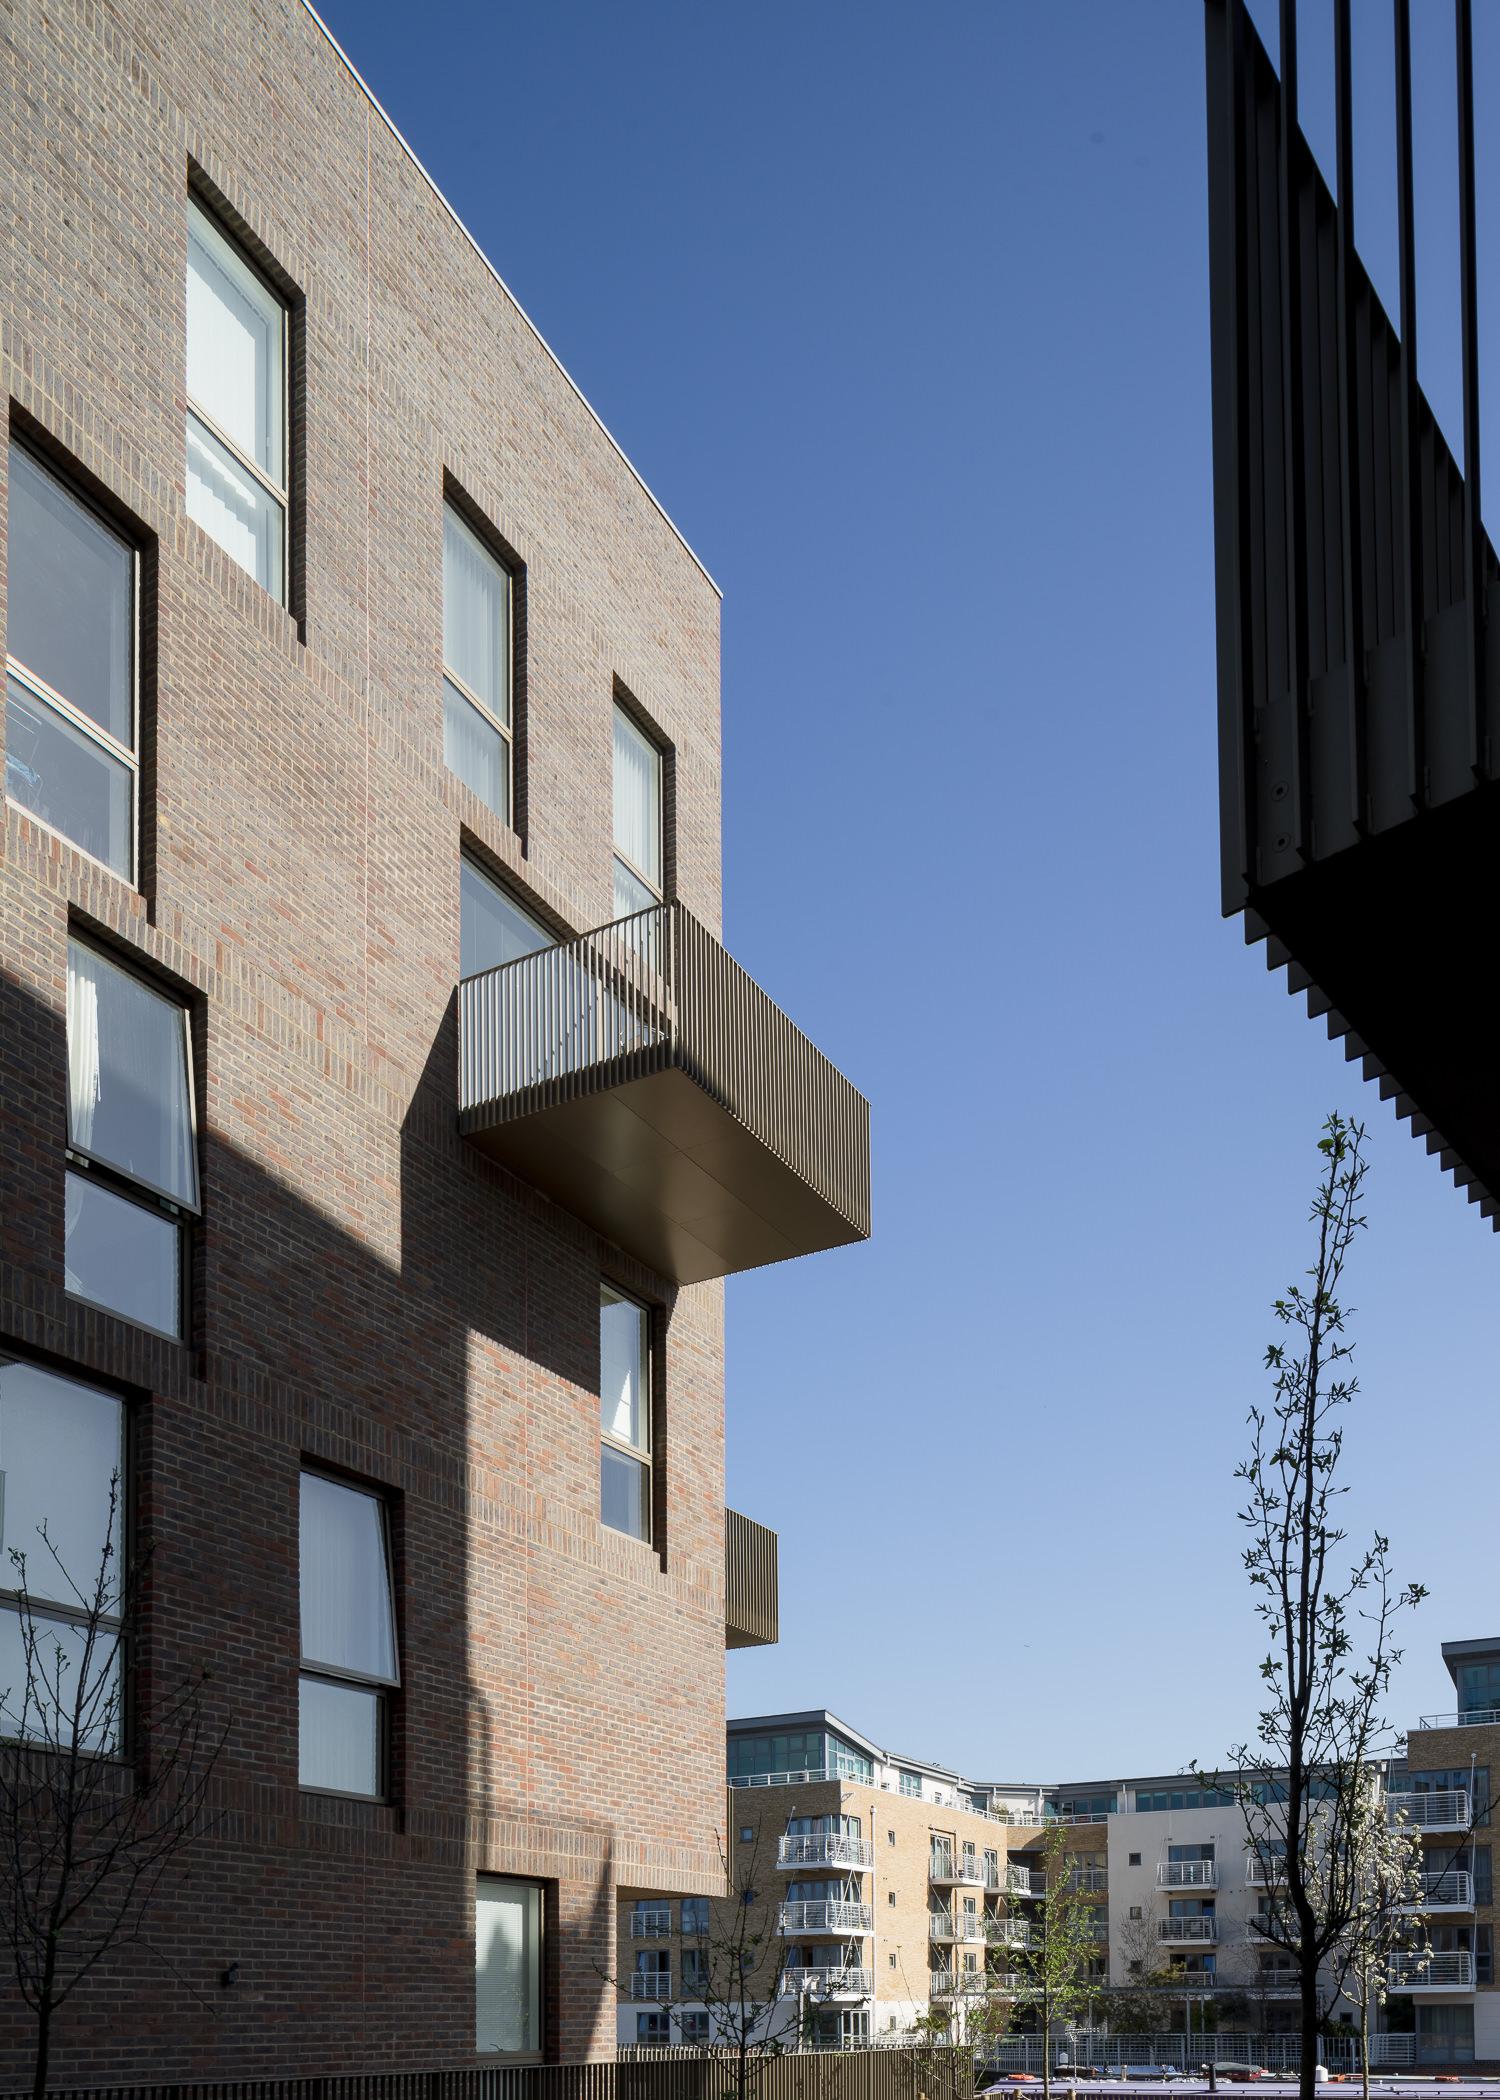 duggan-morris-brenrtford-lock-mark-hadden-amsterdam-architecture-photographer-architectuurfotograaf-036.jpg